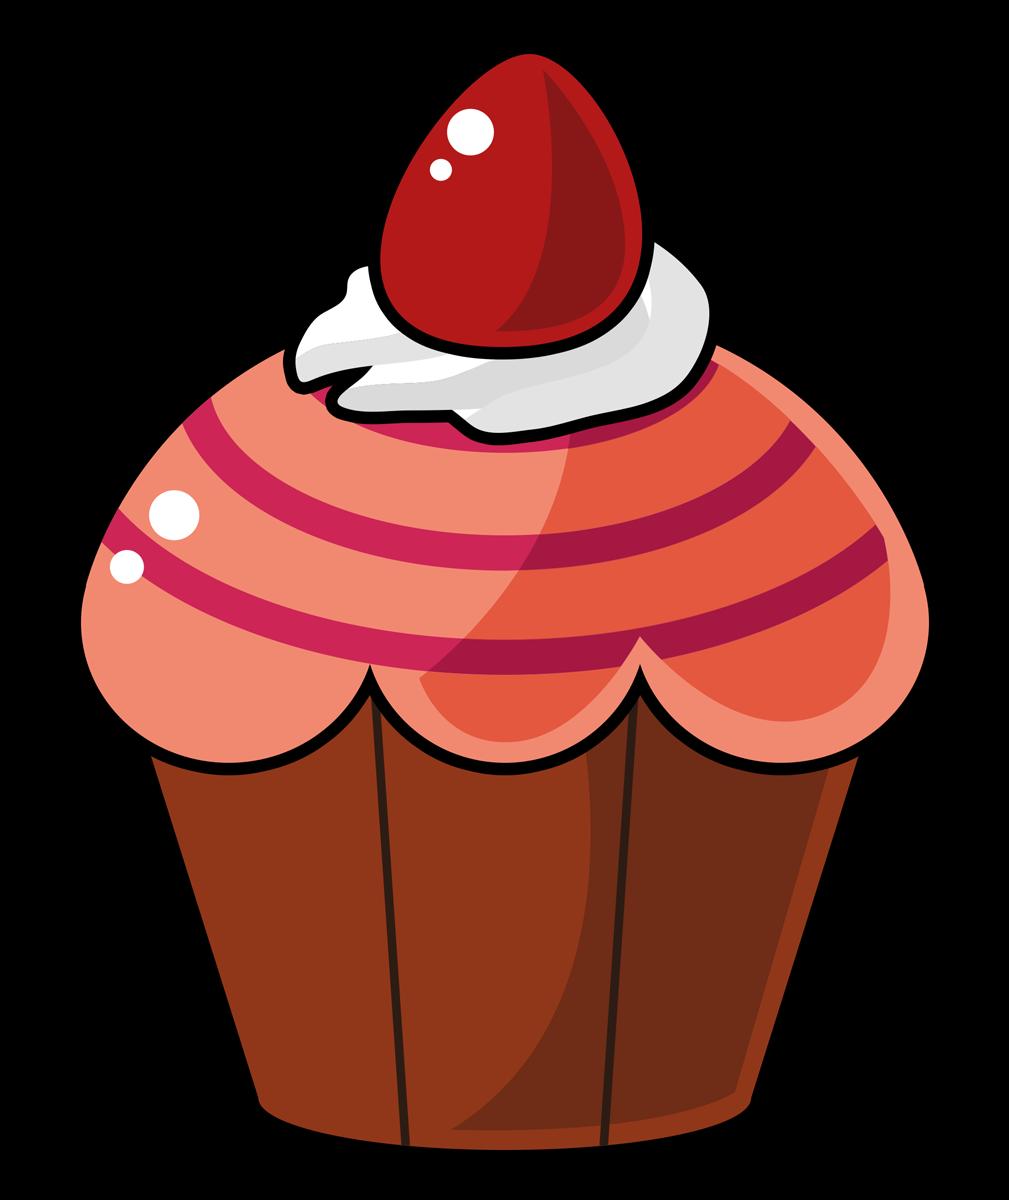 1009x1200 Cupcake Free To Use Clip Art 2